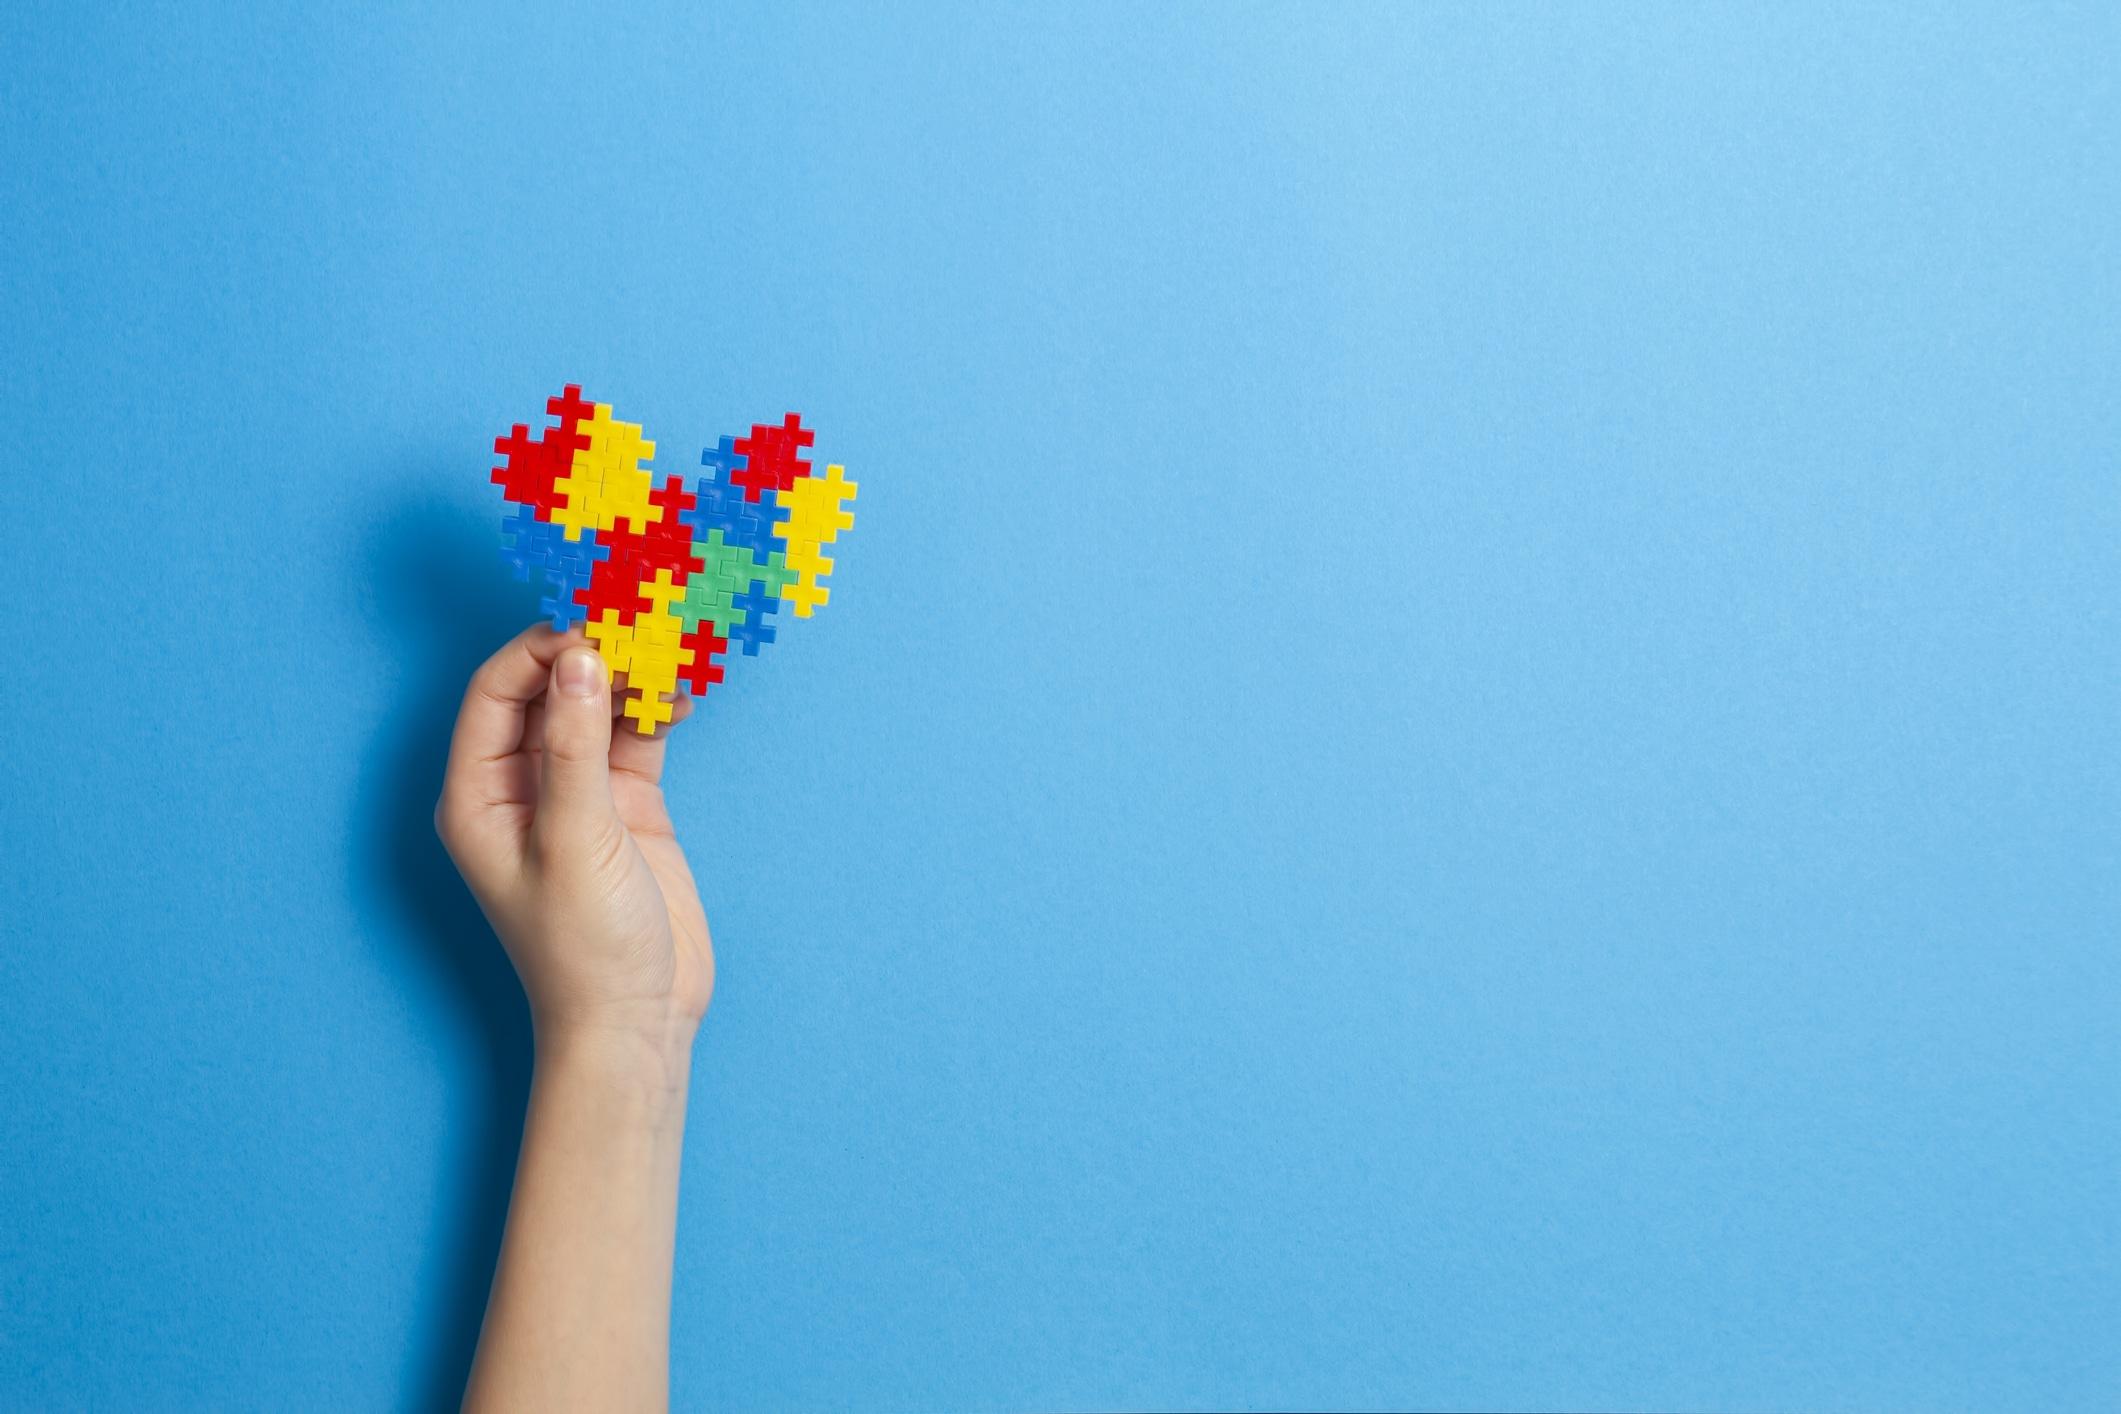 Celebrate autism awareness month during April